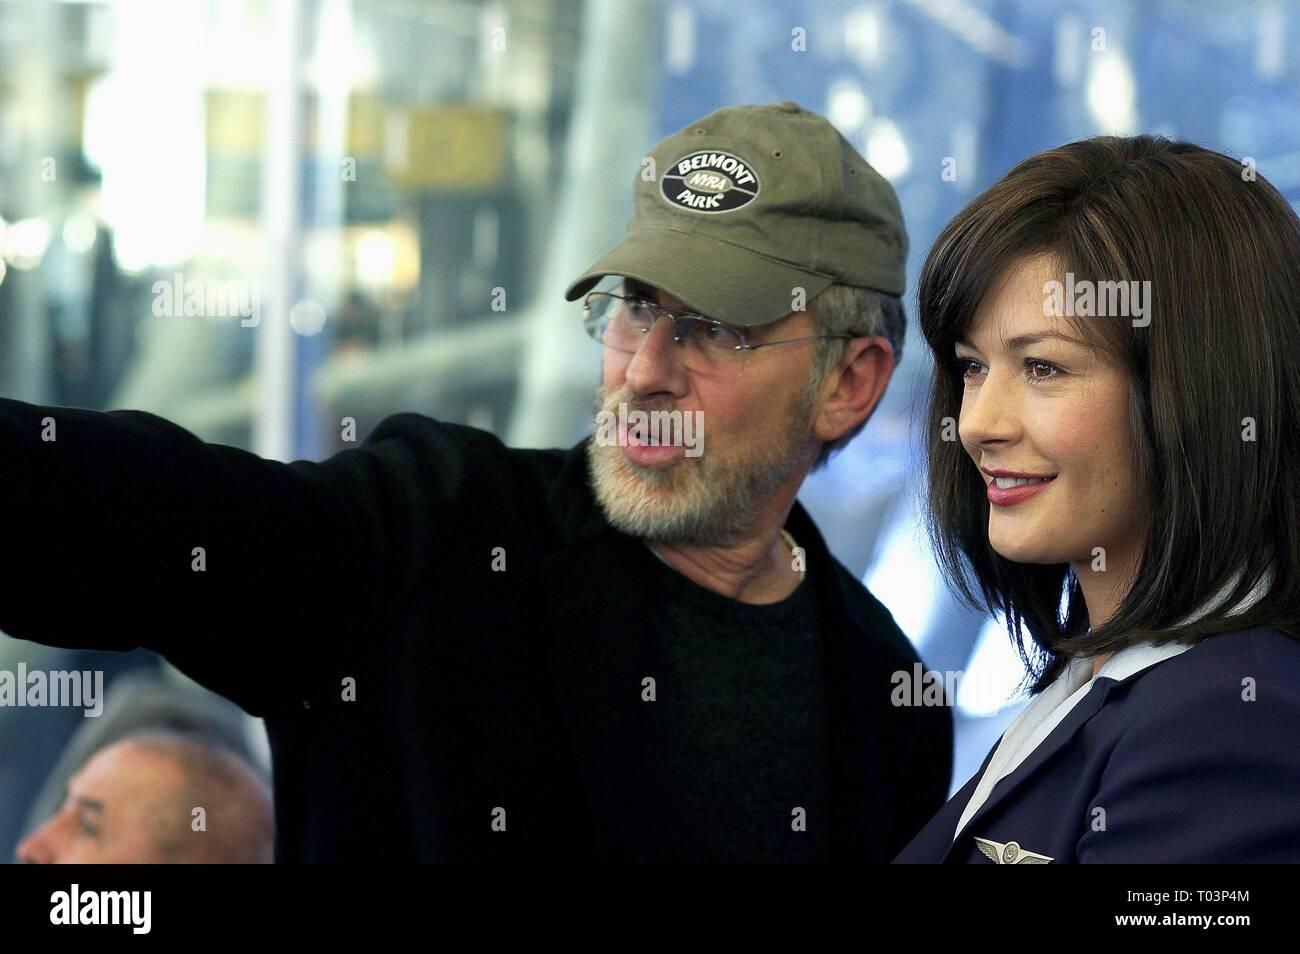 Steven Spielberg Catherine Zeta Jones The Terminal 2004 Stock Photo Alamy